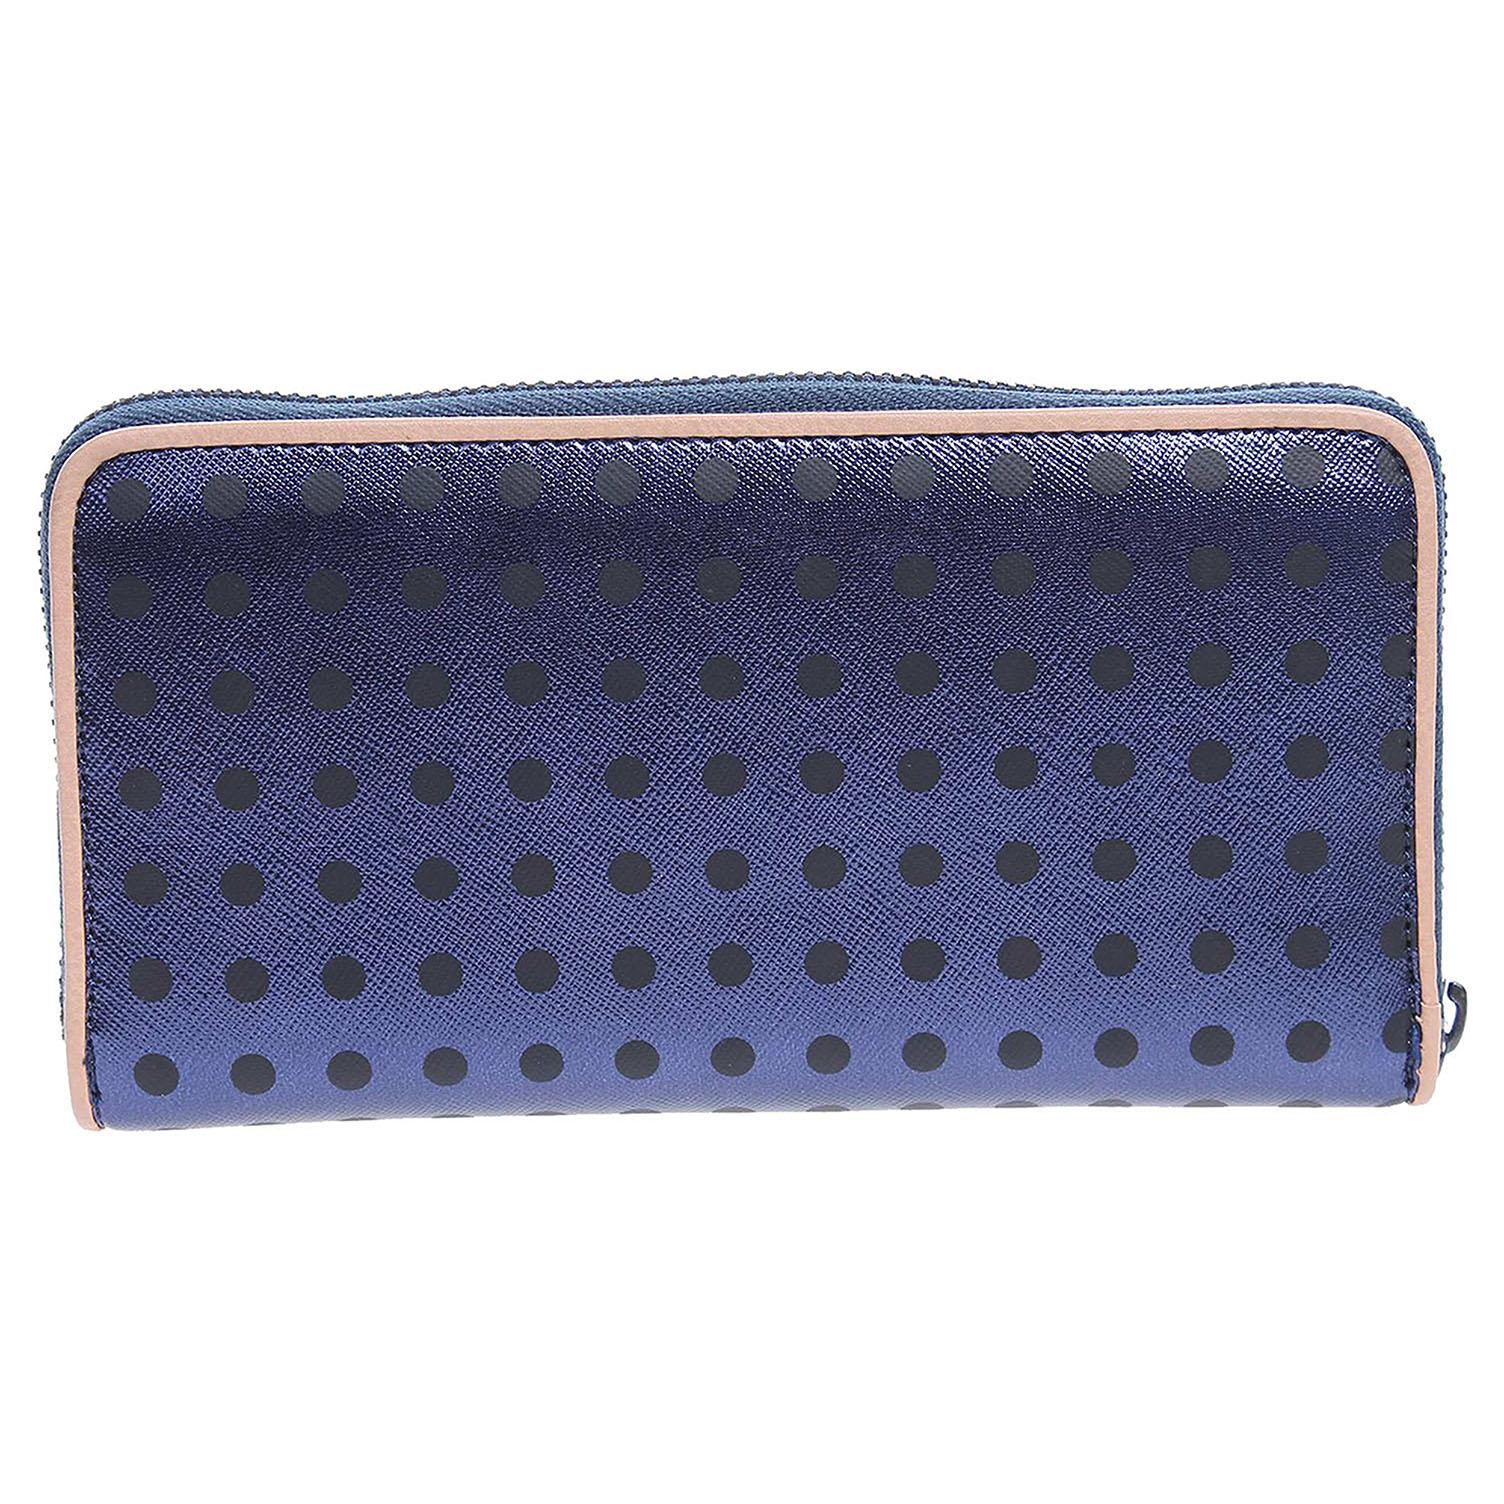 Hello Kitty 19229.6 azul dámská peněženka modrá 1